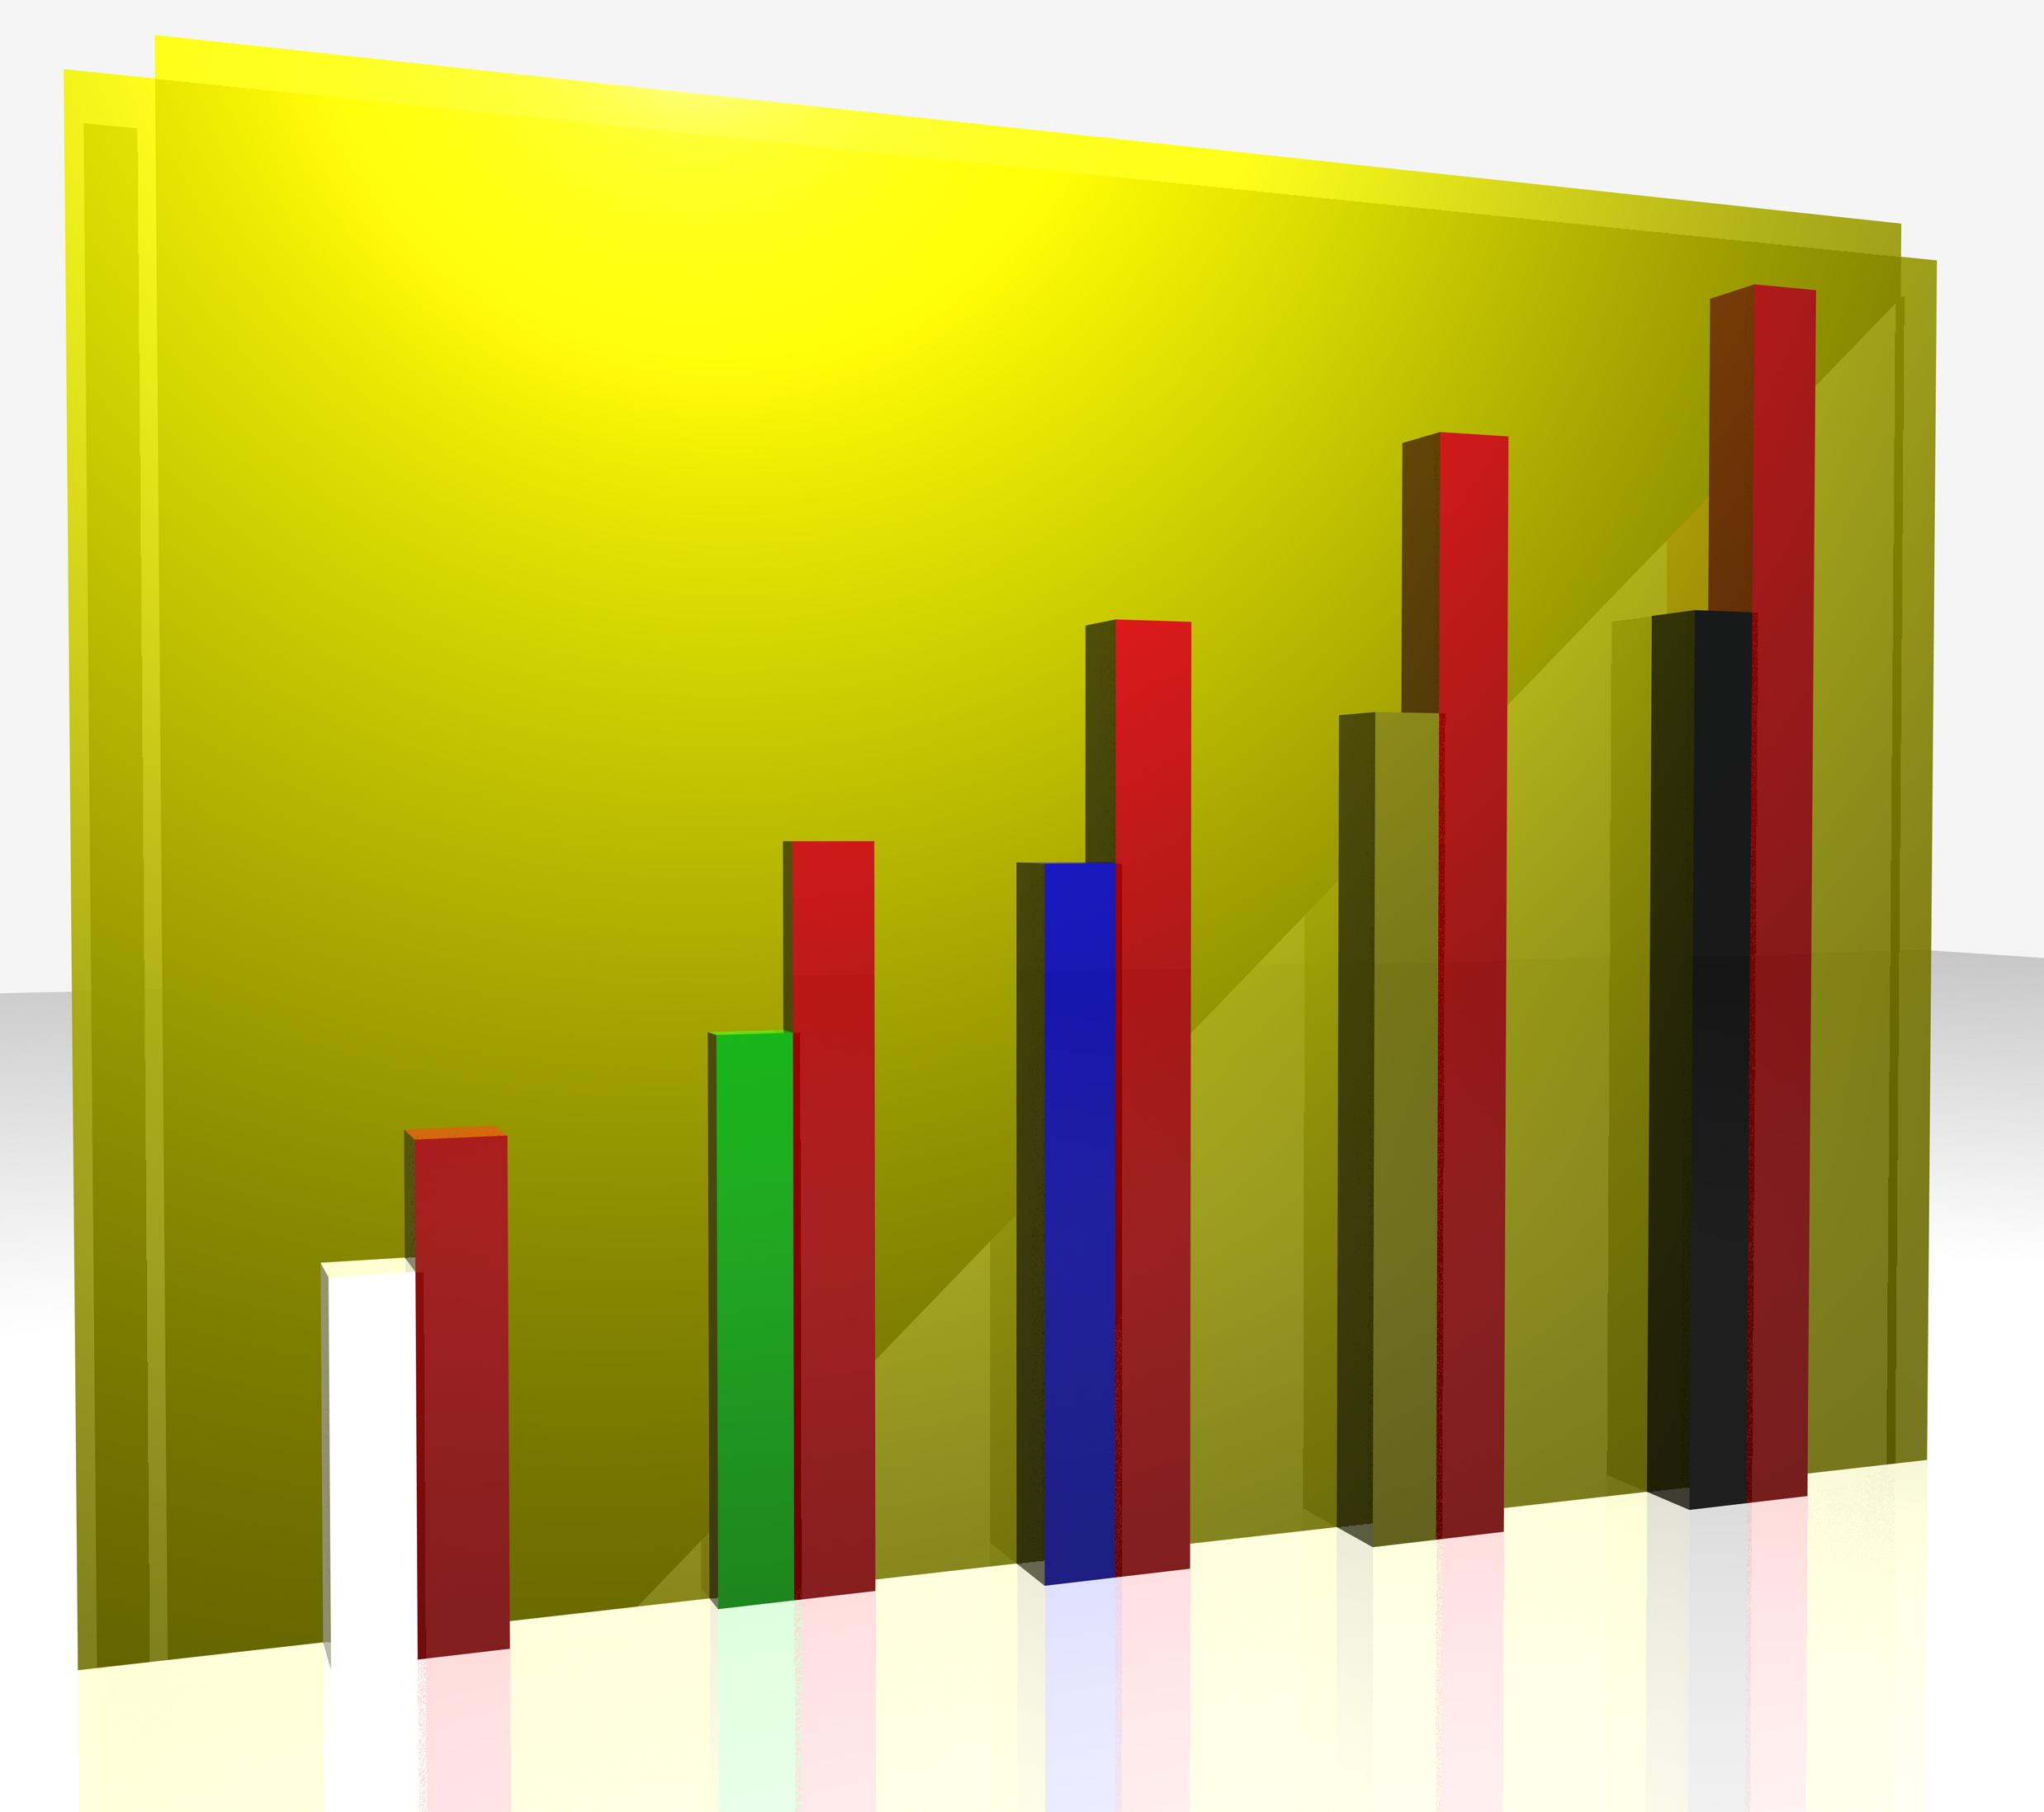 Global Energy, Mining, Utilities Trends Report 2014 Mergermarket